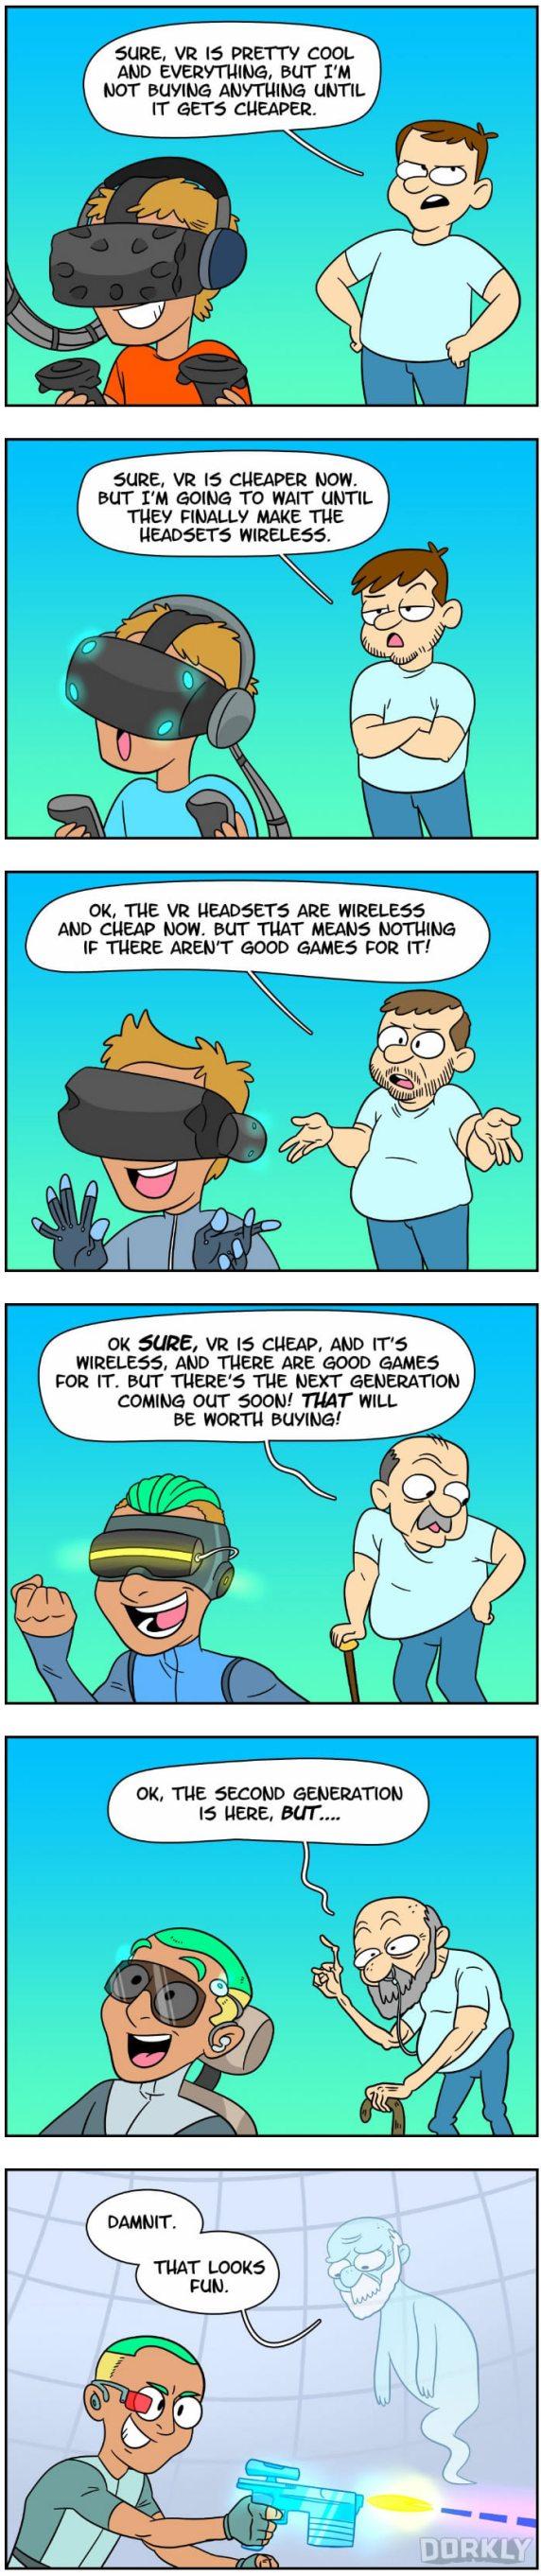 wait next generation vr headset